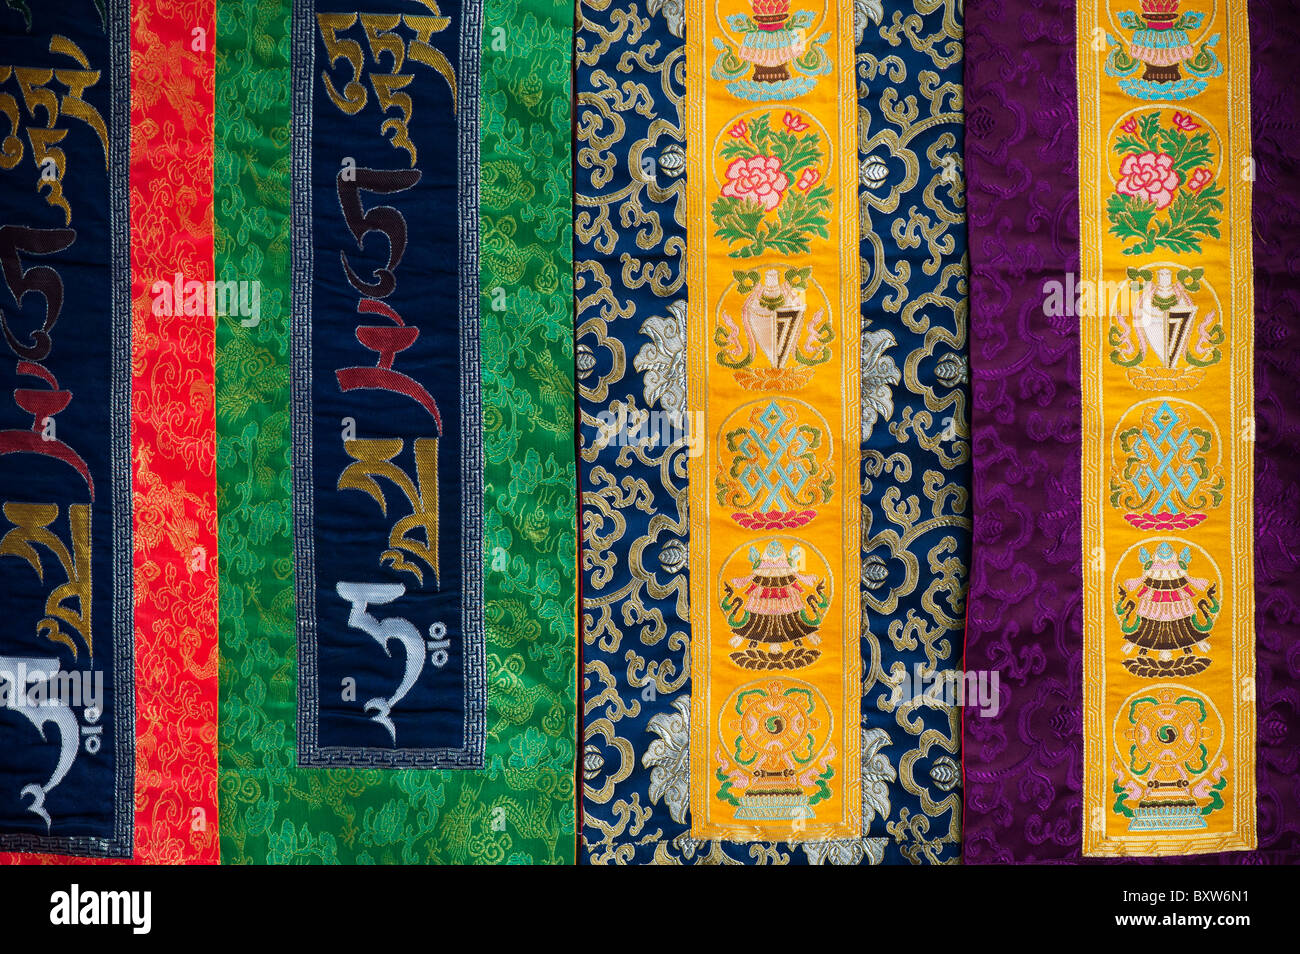 Colourful Tibetan Buddhist wall hangings. Andhra Pradesh, India - Stock Image